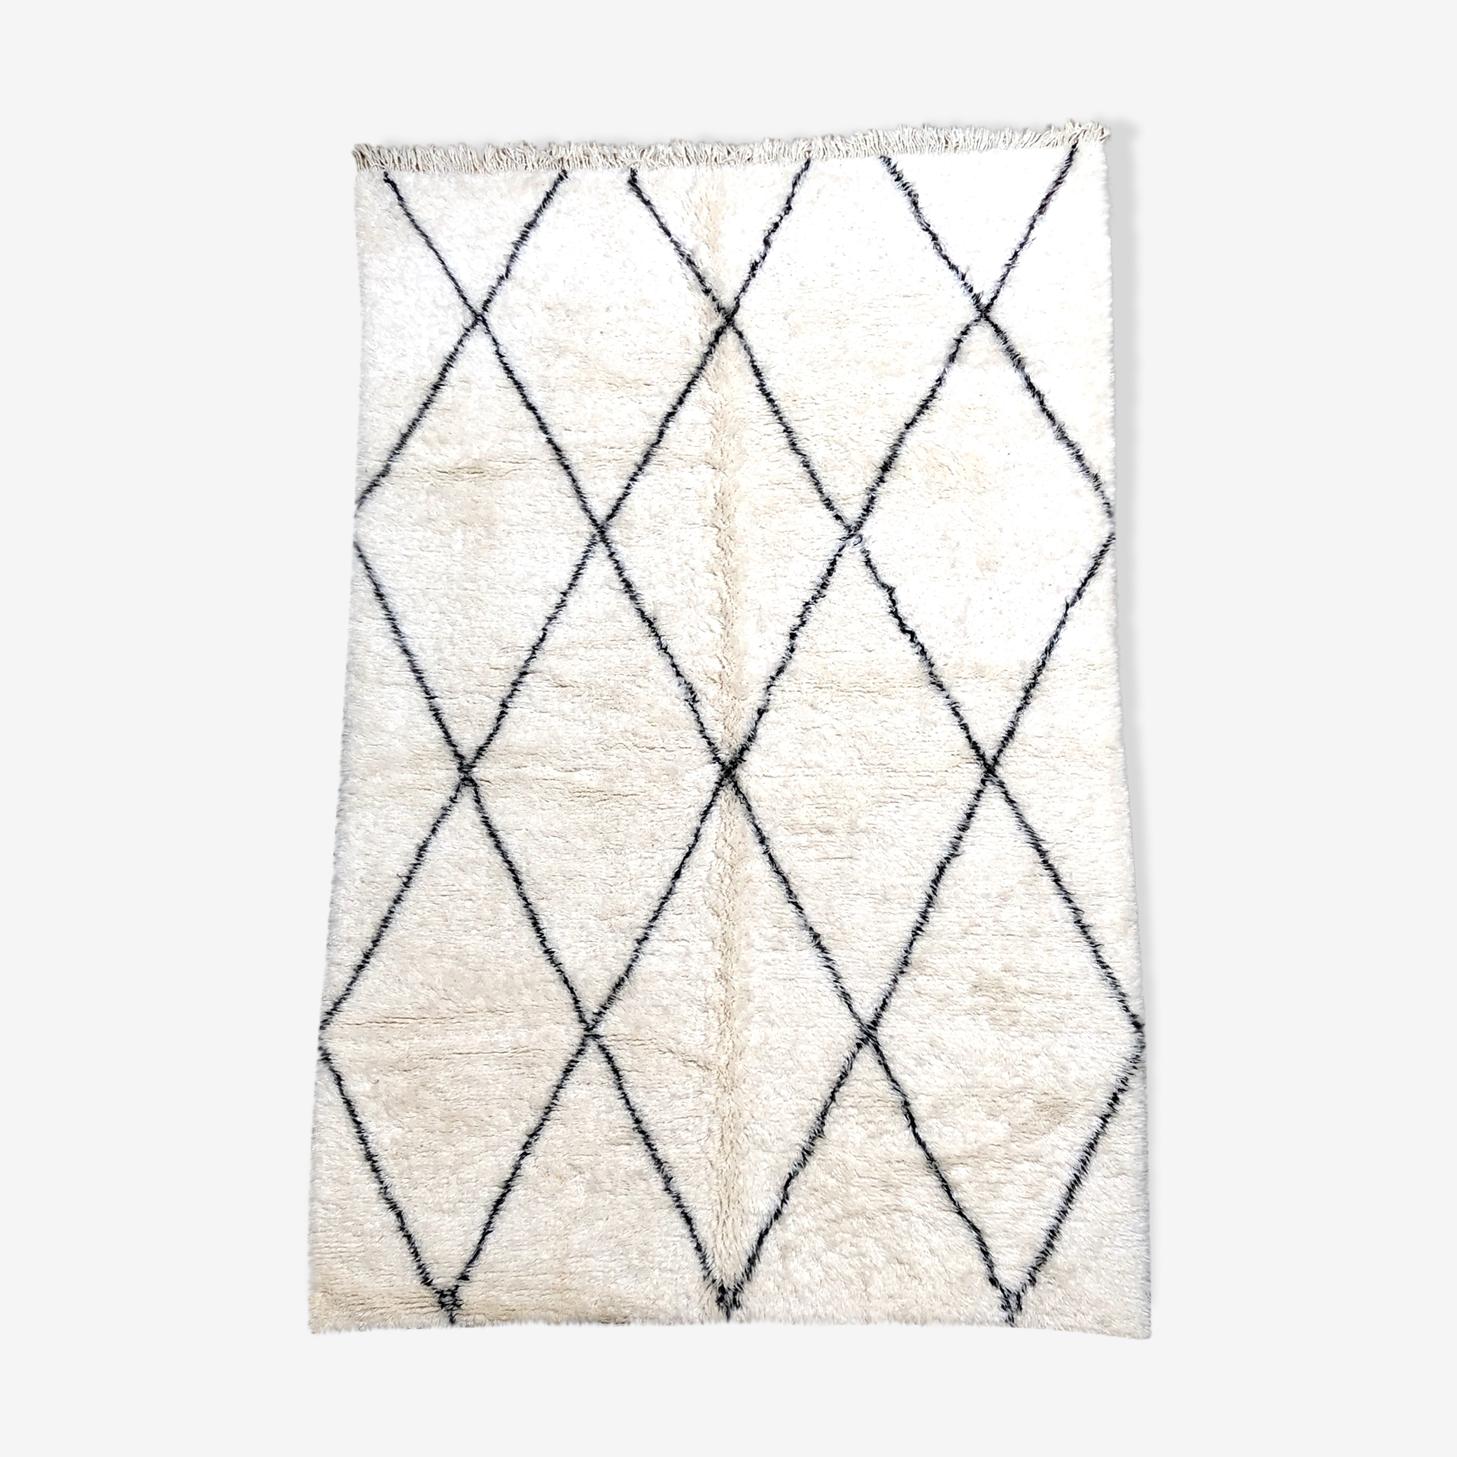 Tapis berbère marocain beni ouarain marmoucha 327x204cm